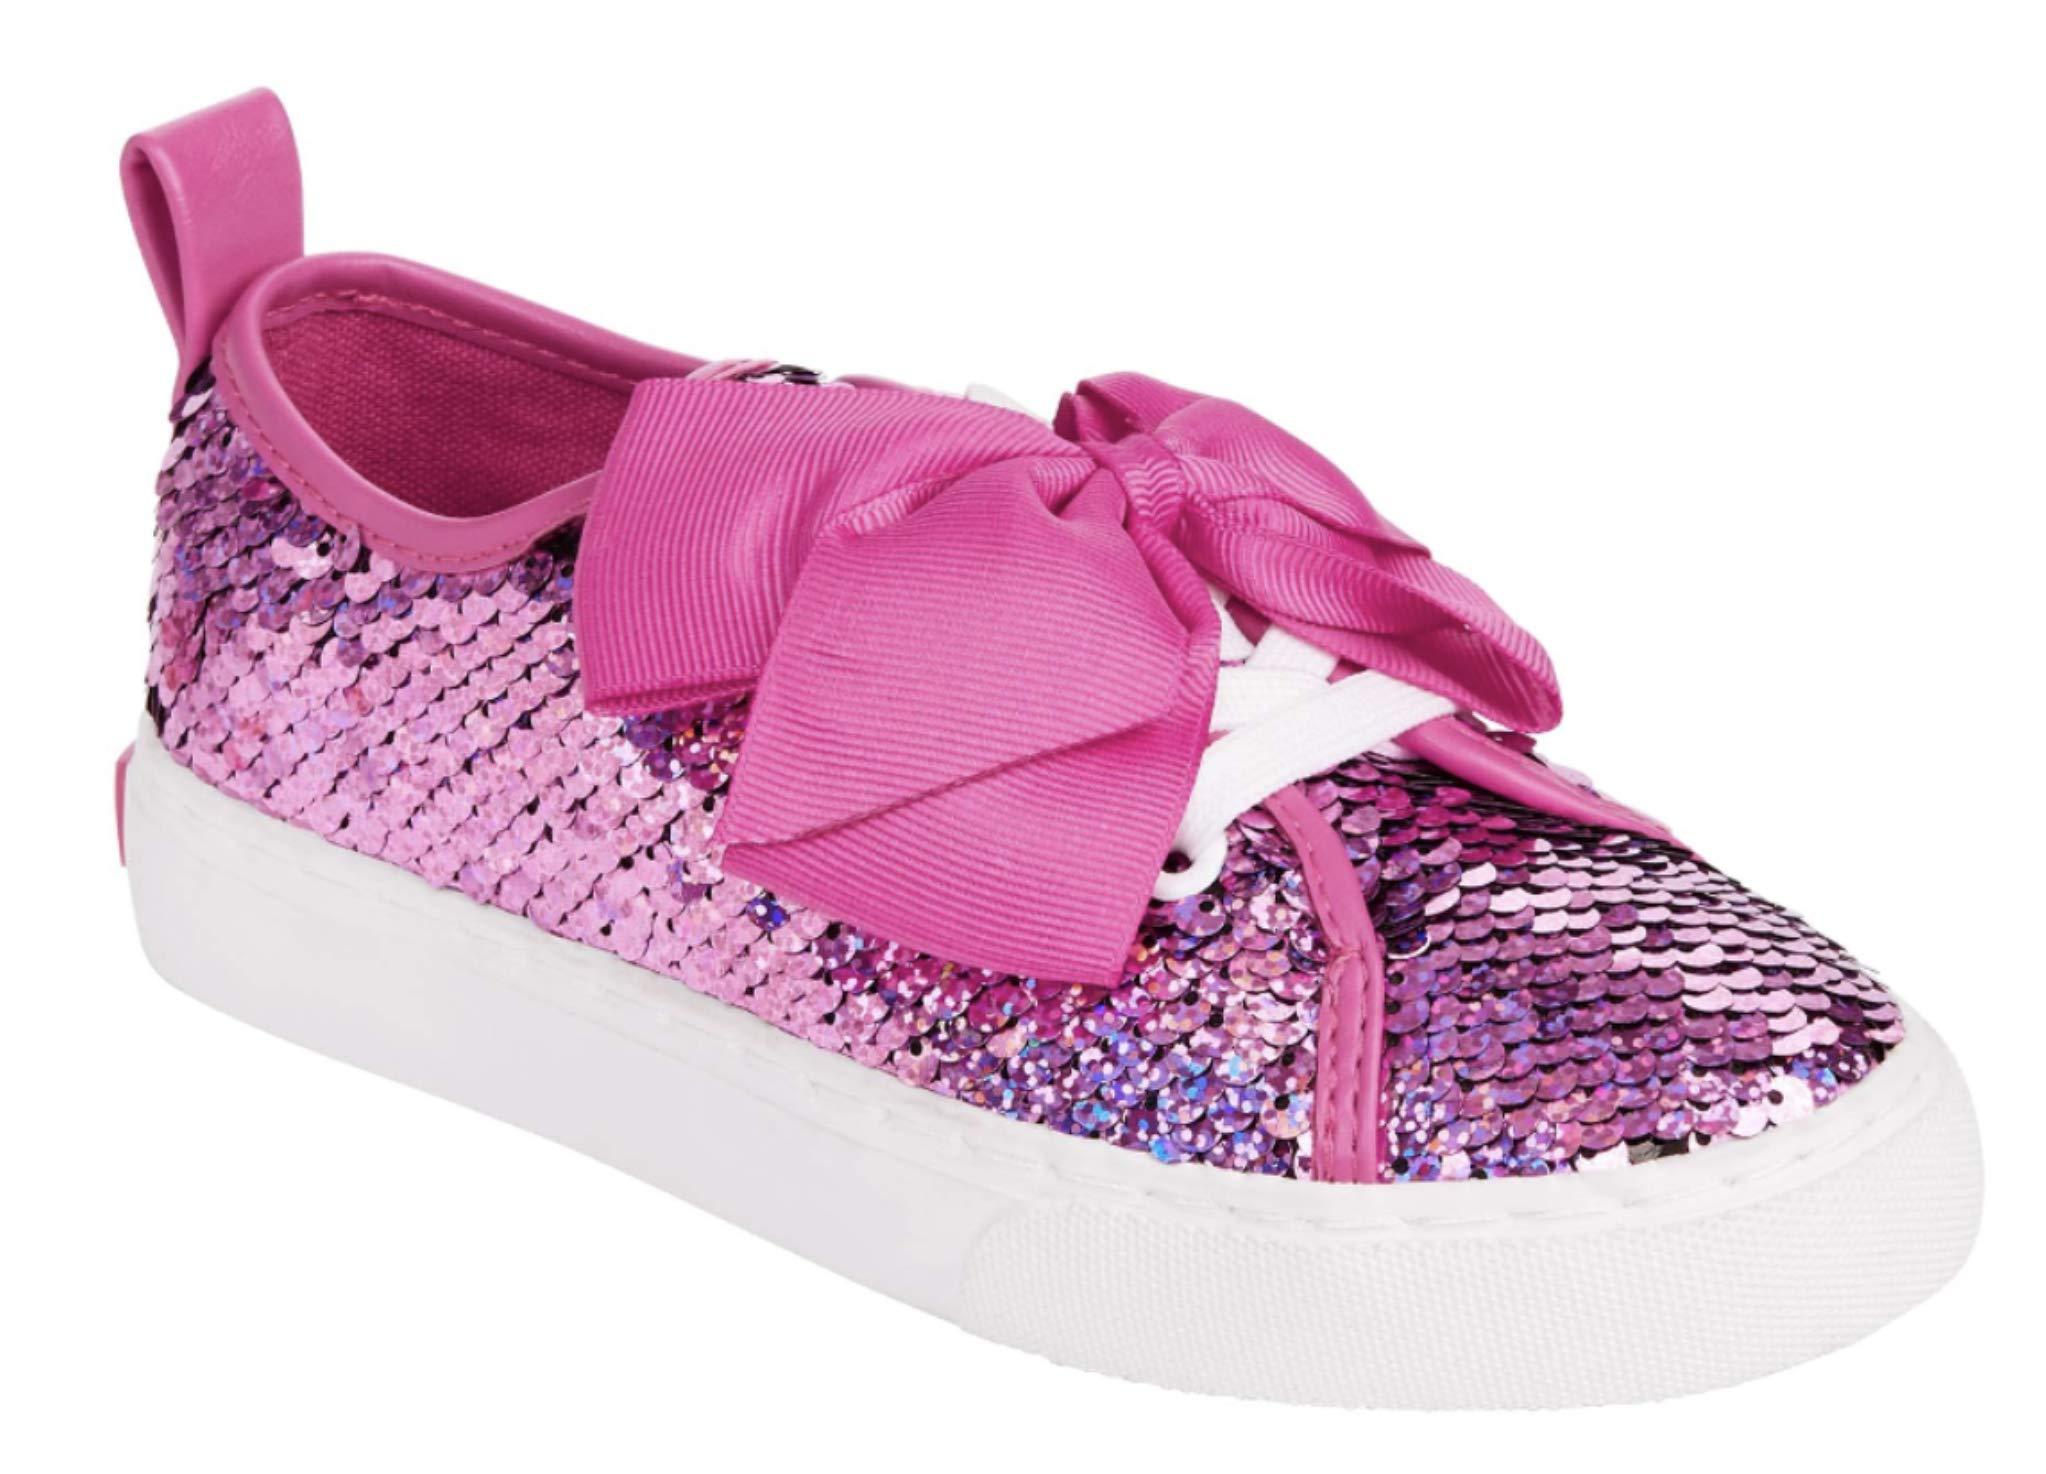 JoJo Siwa Girls Slip On Reversible Sequin Sneakers (12 M US Little Kid, Pink Sequin)